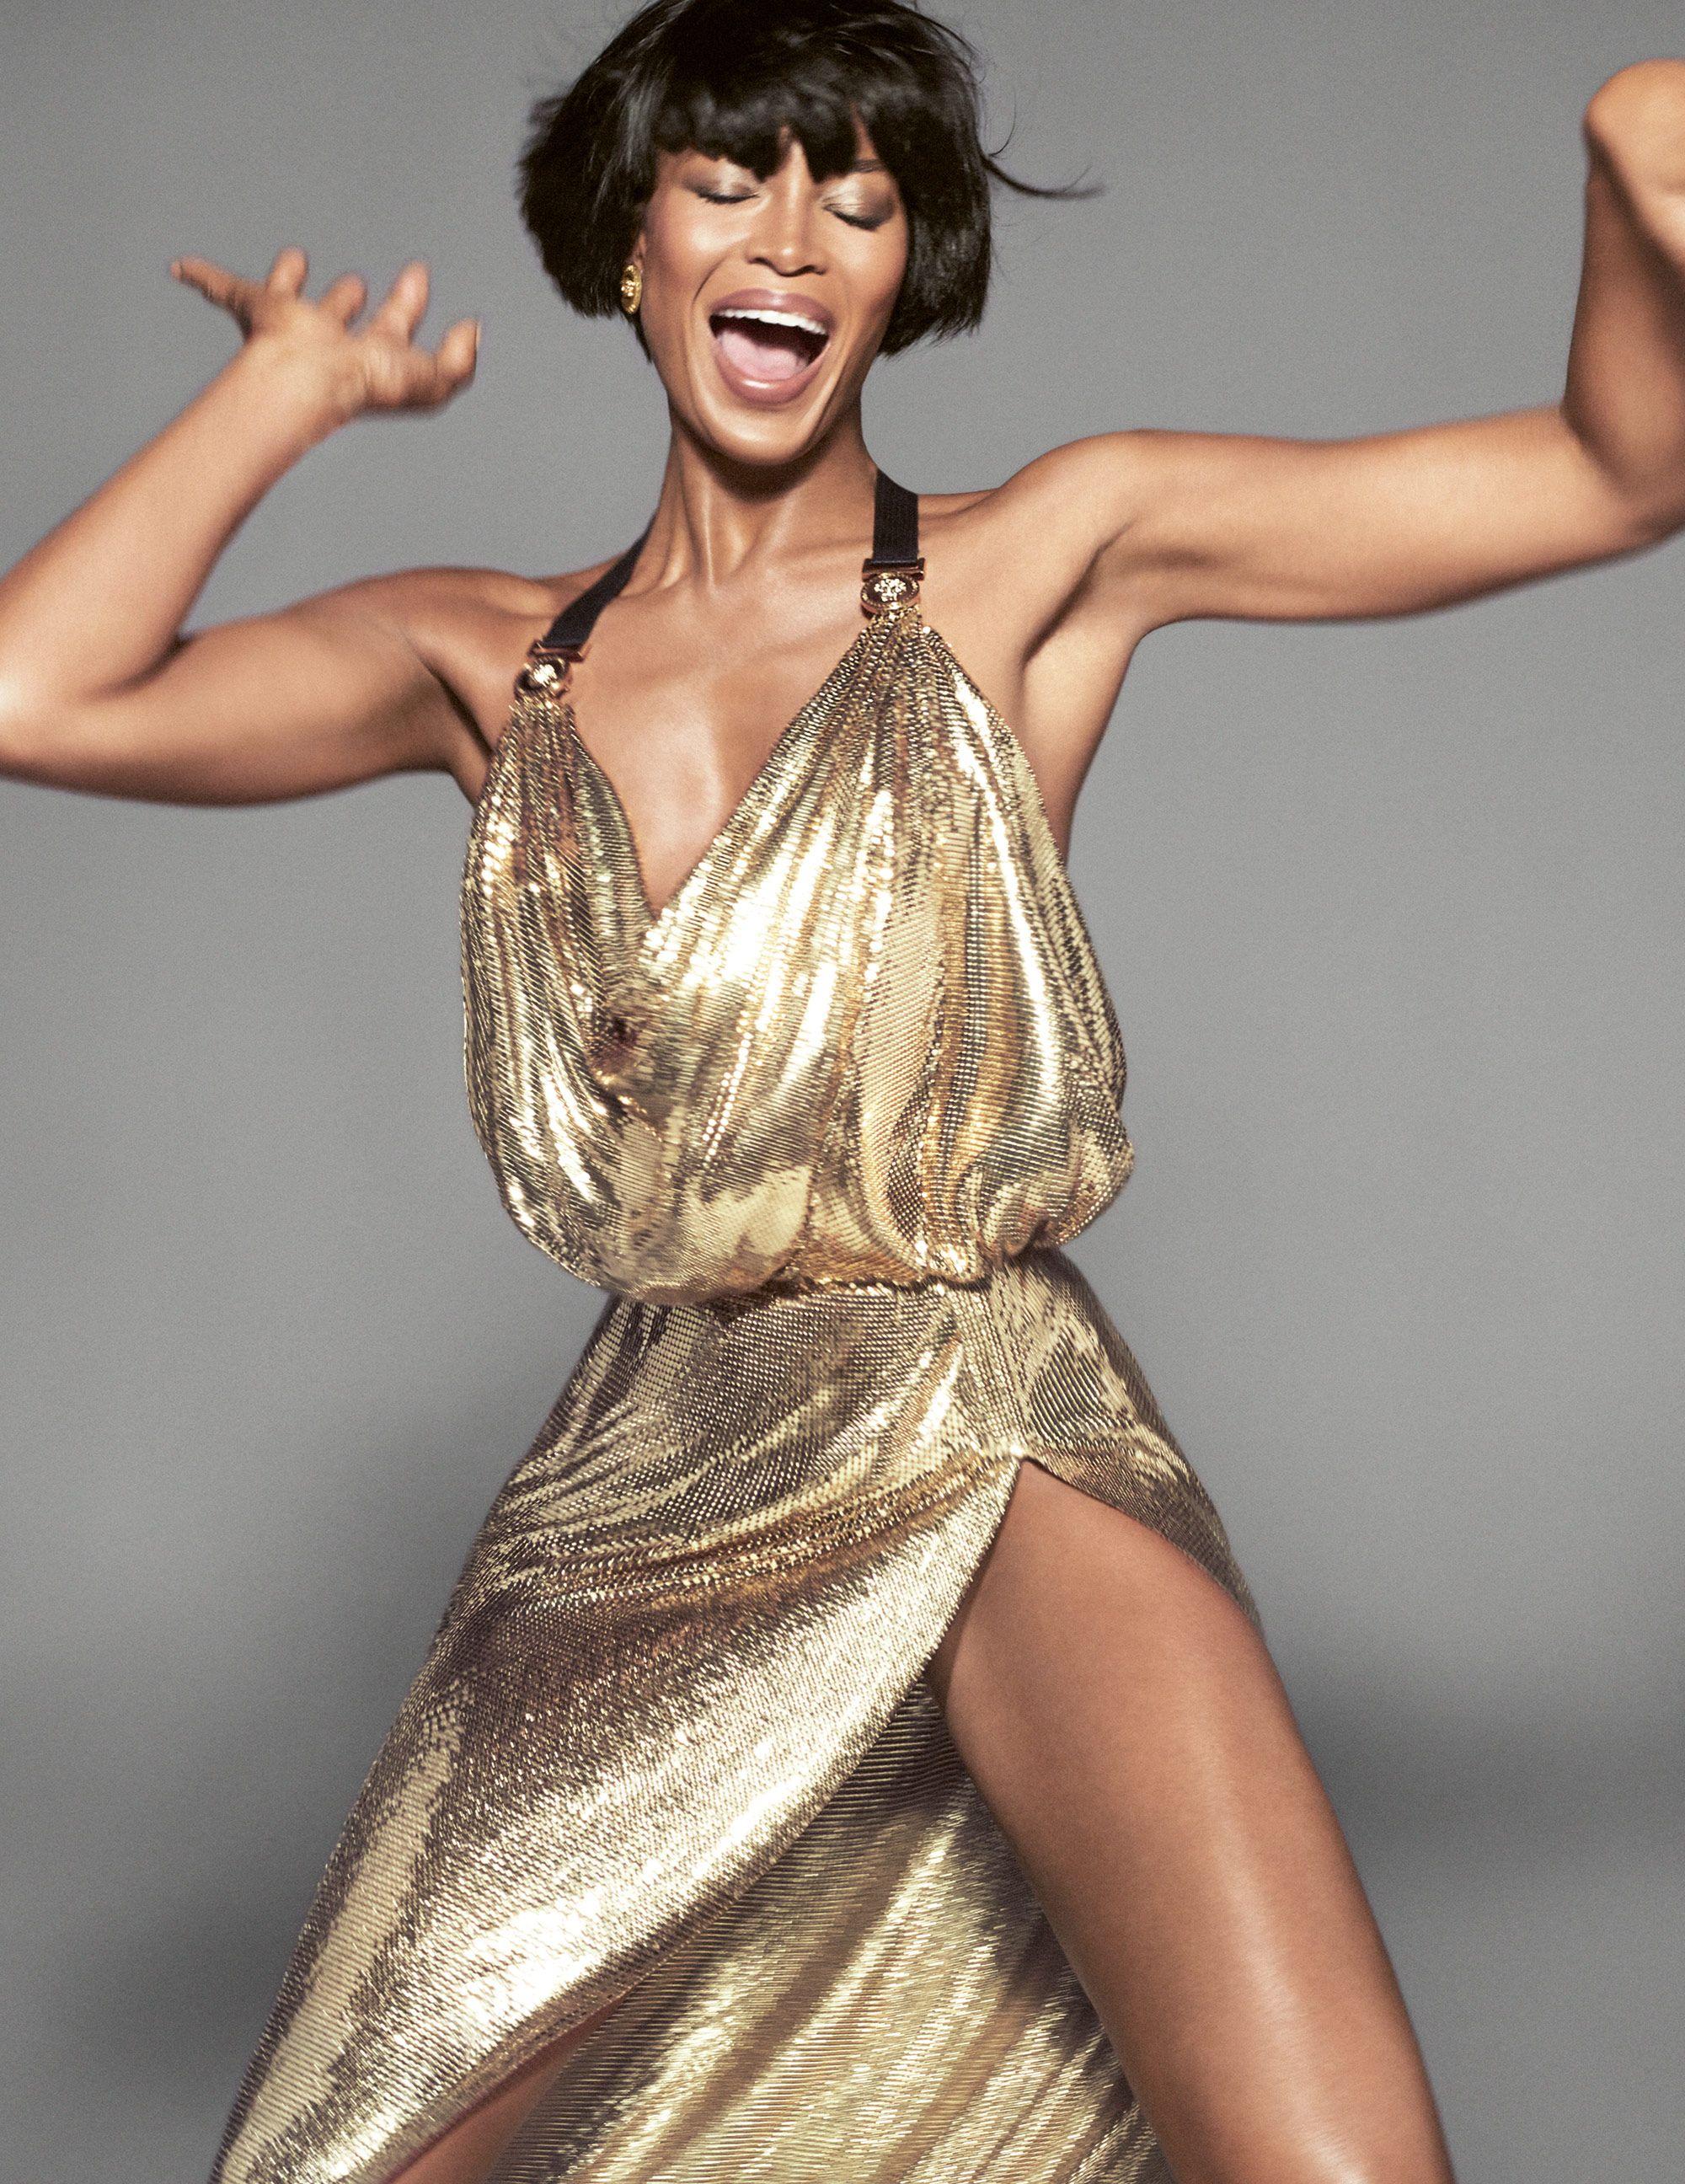 219d0d313c8d  rsquo 90s Supermodels Pose for Versace rsquo s New Campaign